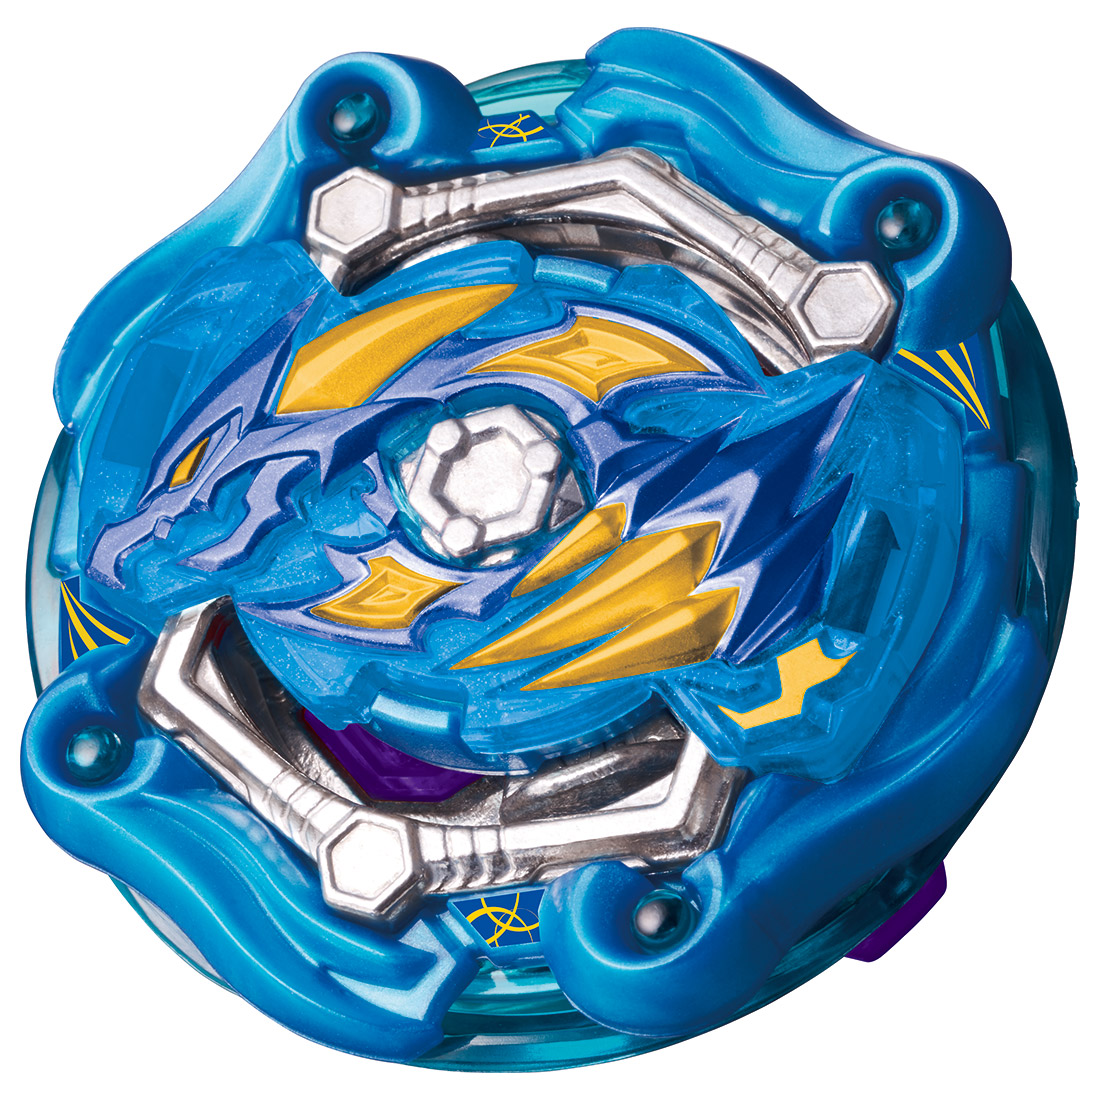 Cosmo Dragon Vanguard Revolve Retsu